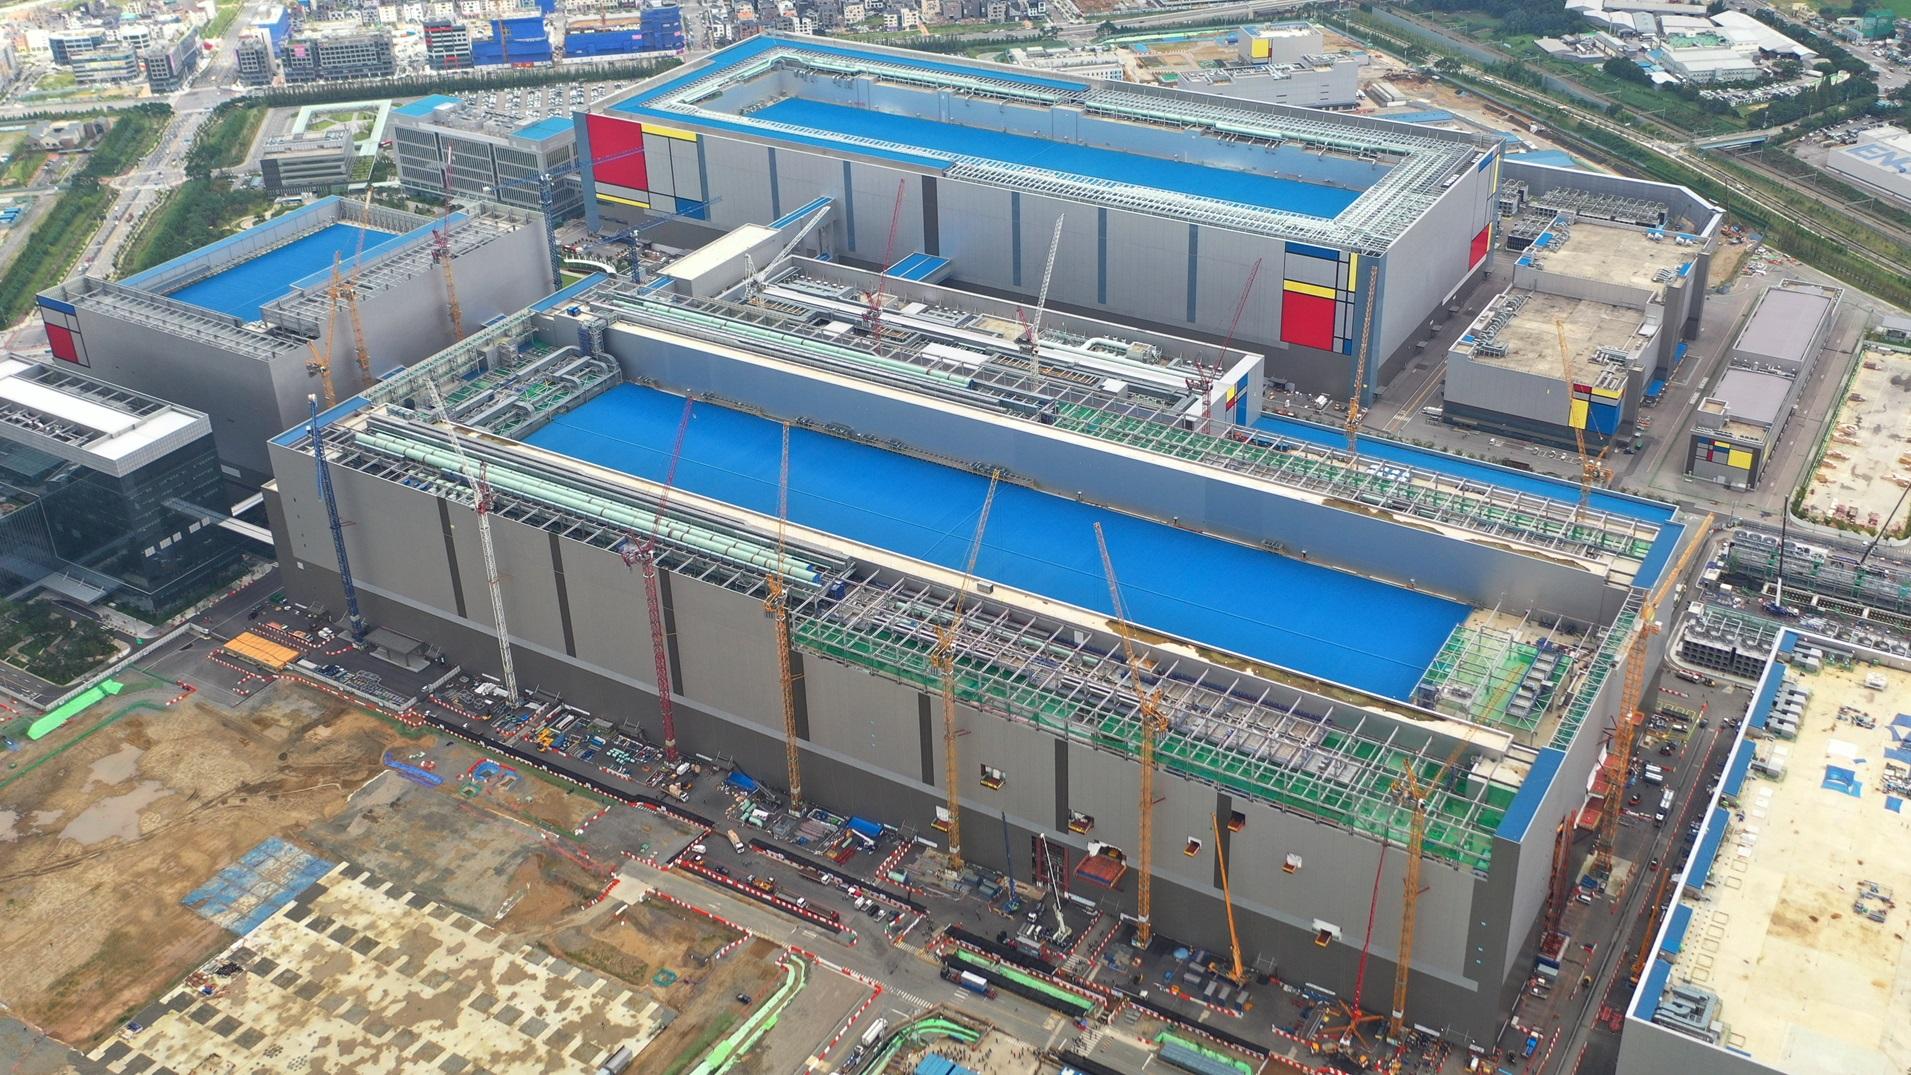 Samsung Foundry Pyeongtaek Line 2 16GB LPDDR5 DRAM Plant